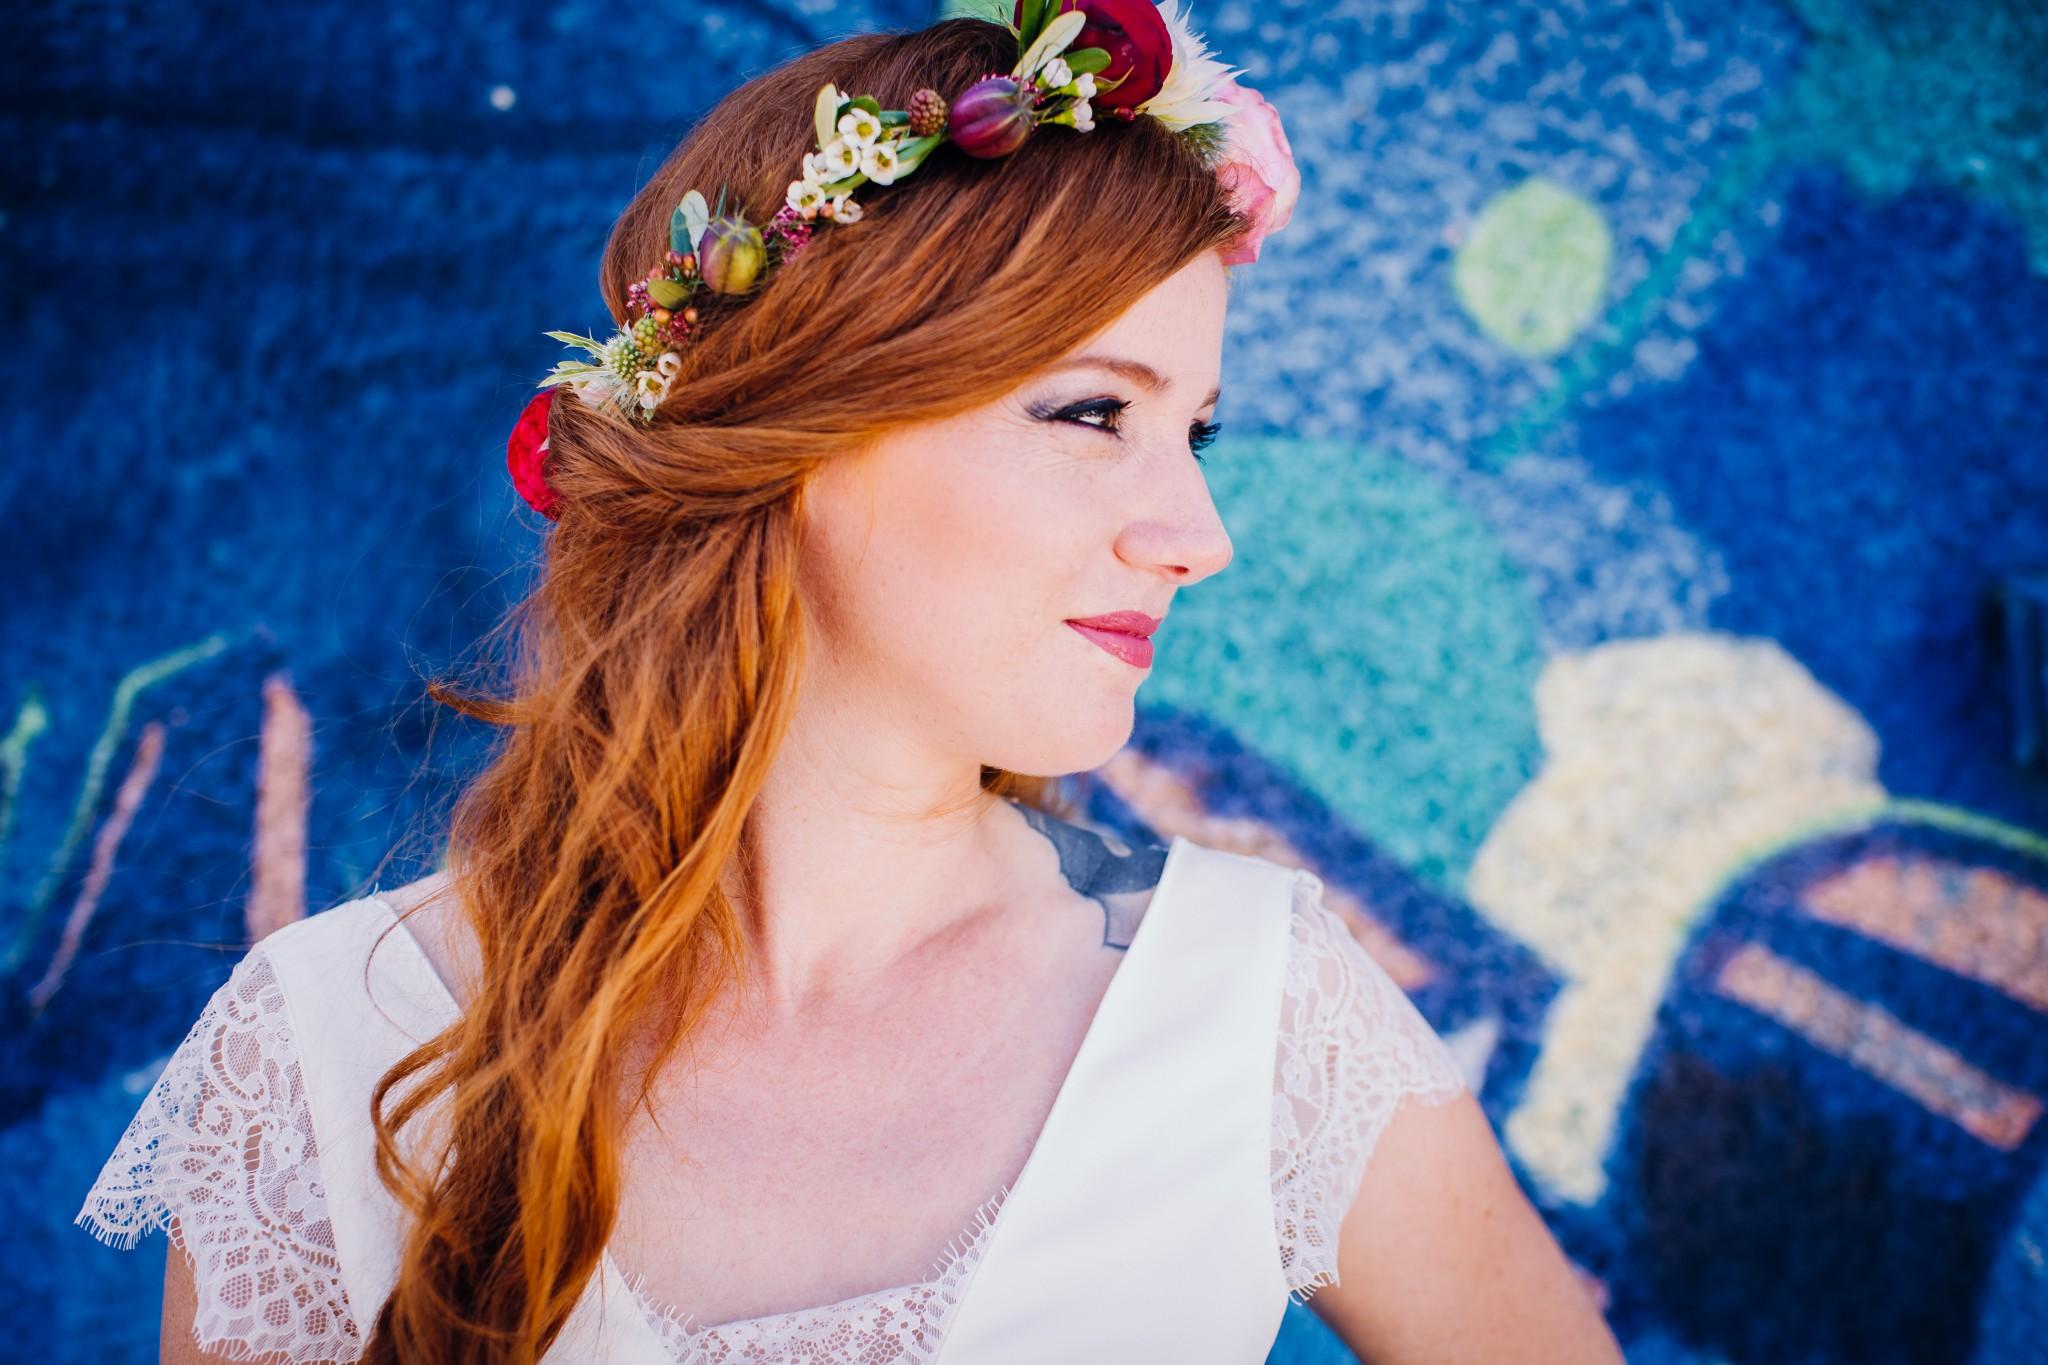 photographe-mariage-toulouse-rocknroll-maries-tatoues-floriane-caux-16